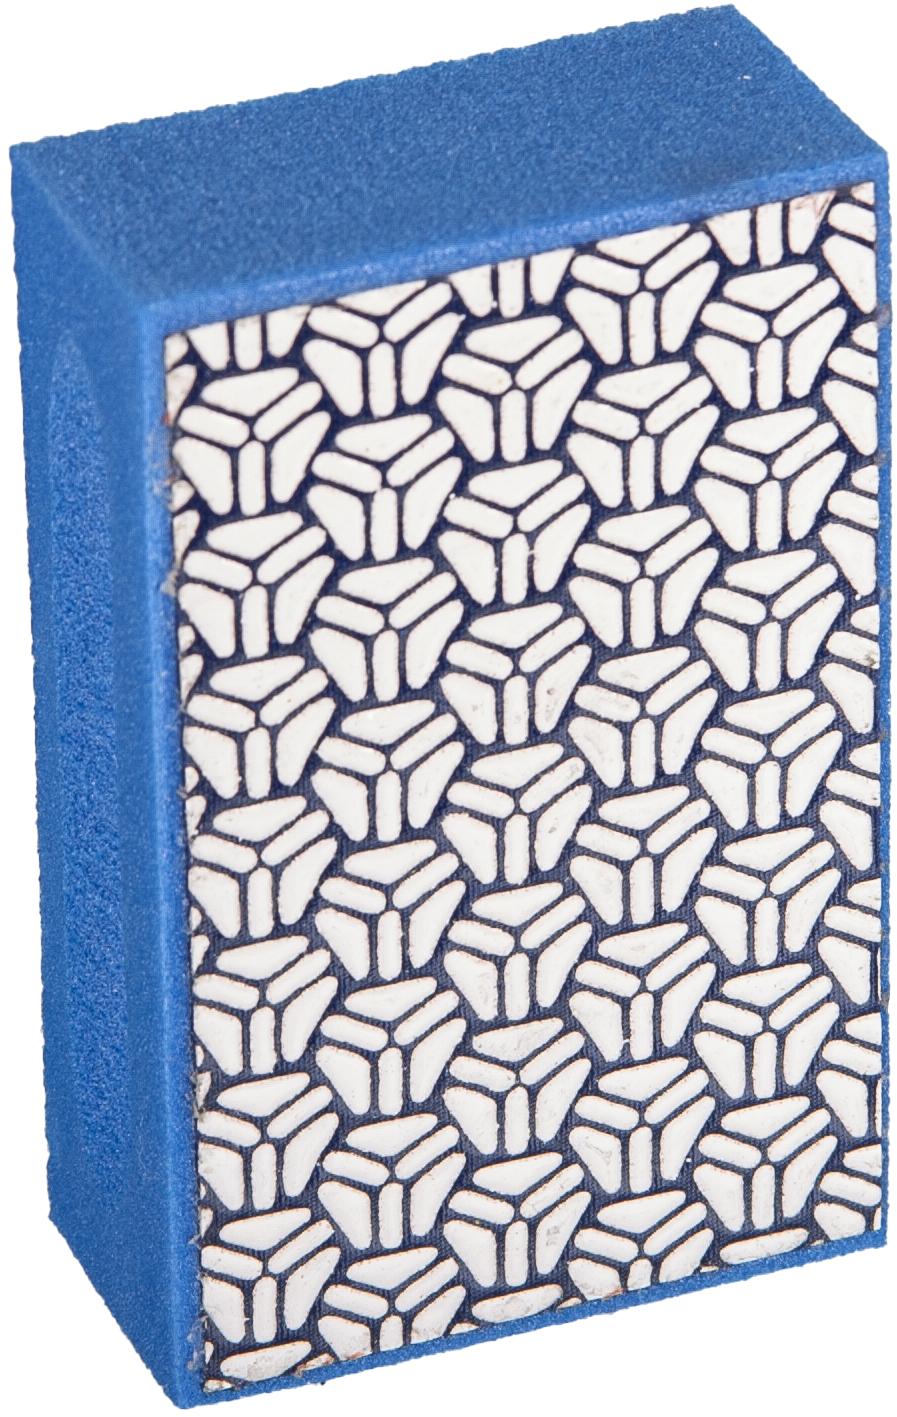 Telum Handpad 90 x 55 mm │ Korn 1500